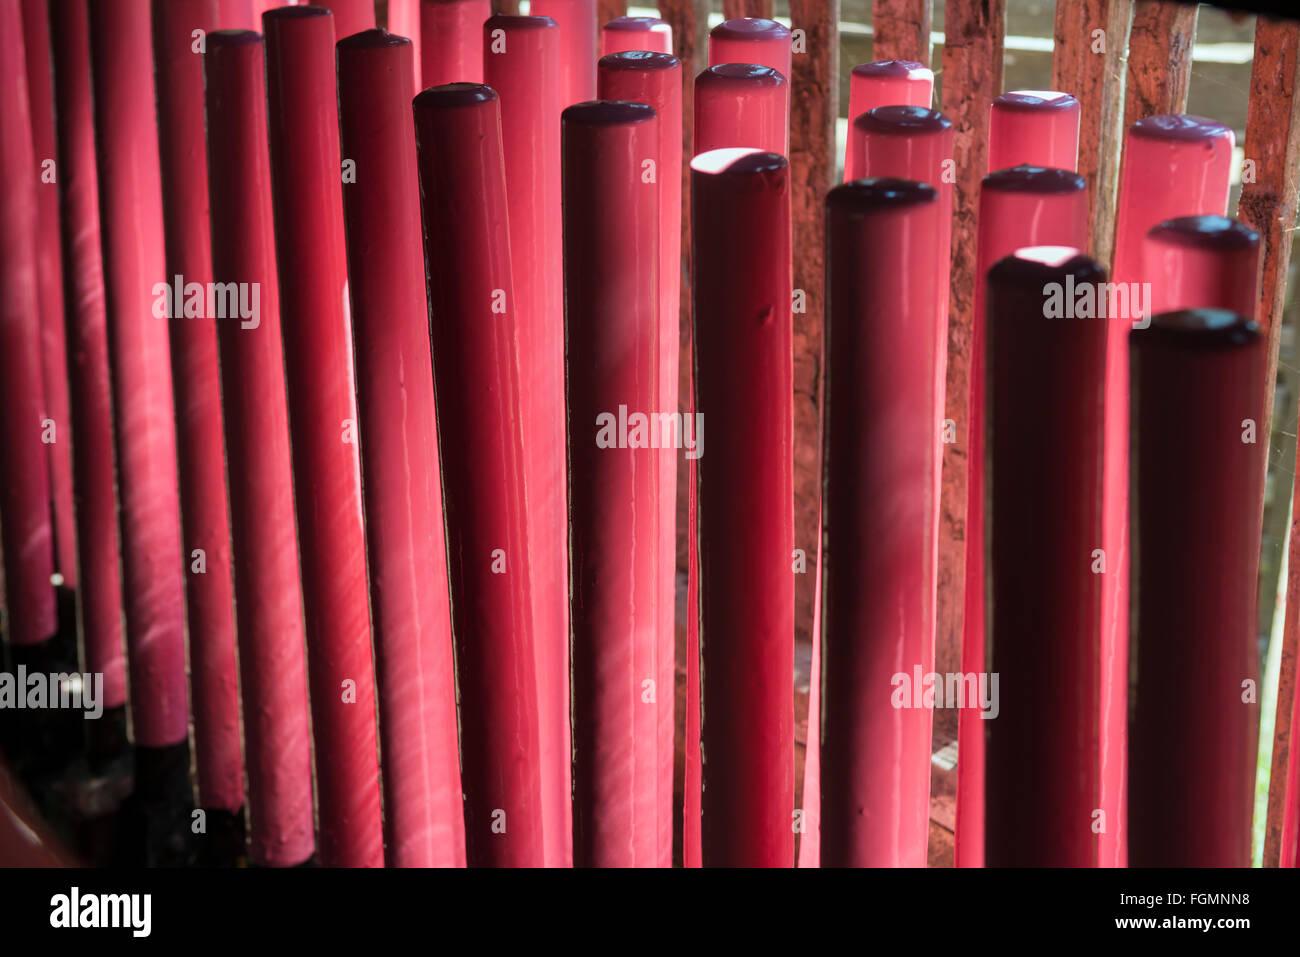 Gummiband-Produktion. Bilu Kyun, Birma Stockfoto